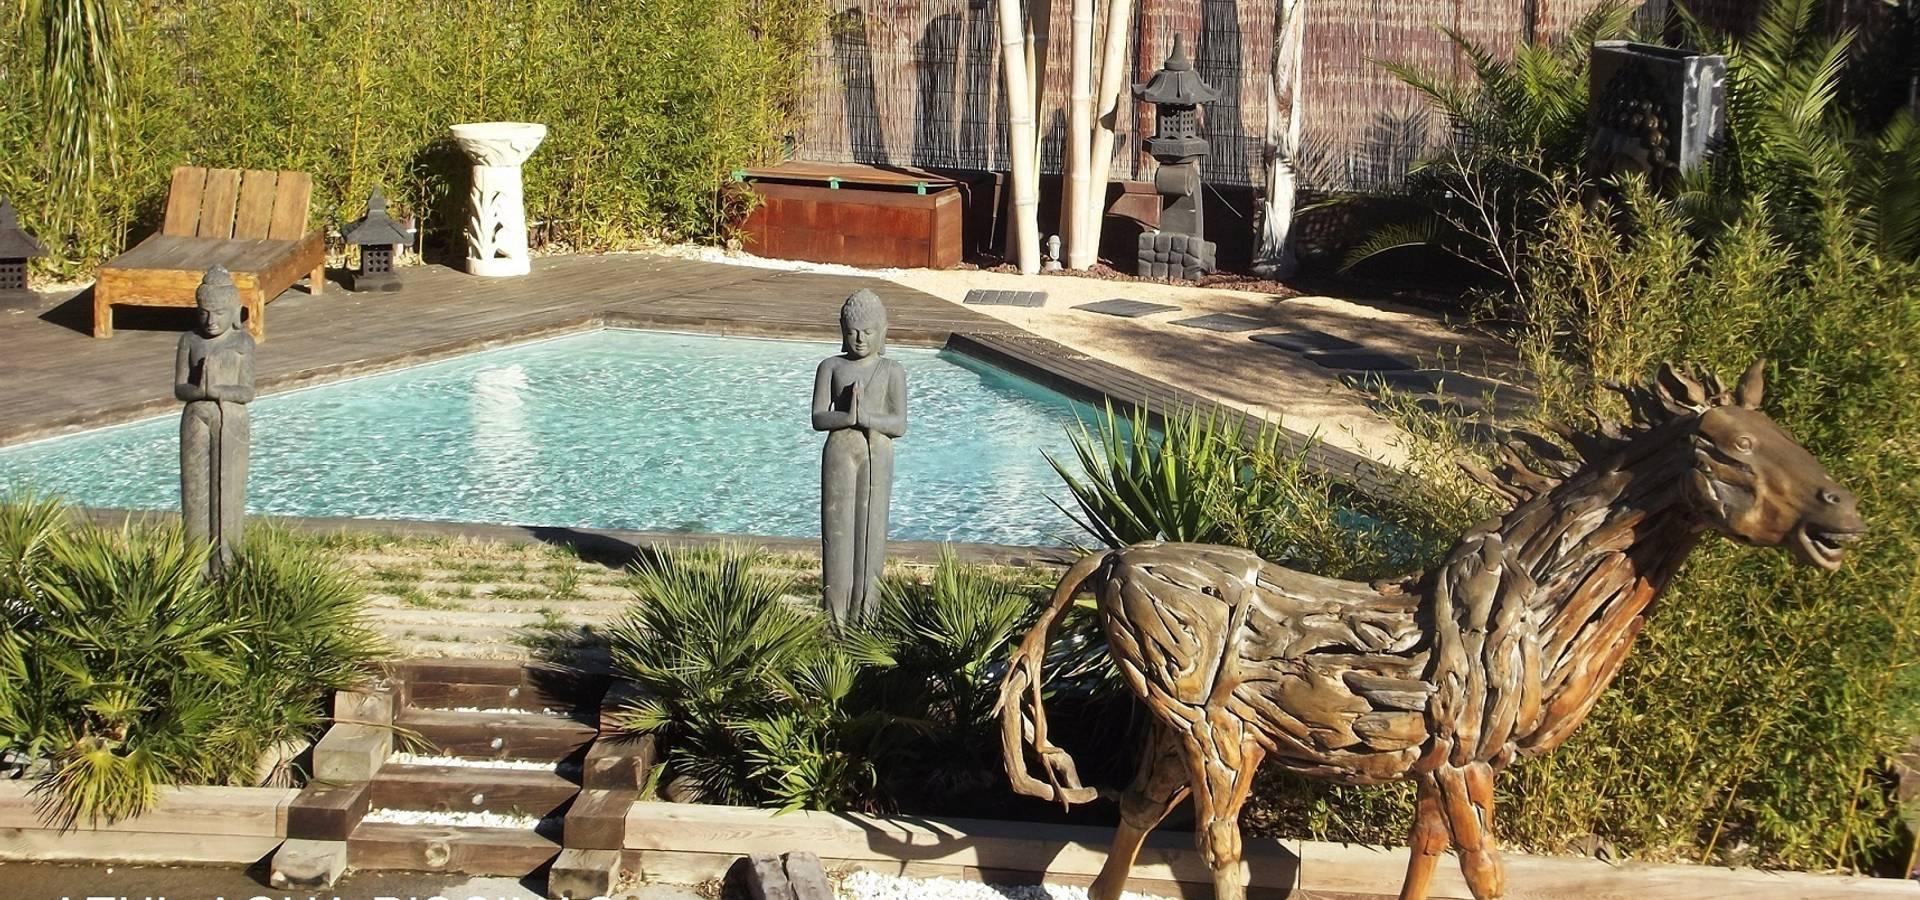 Piscinas azul agua piscinas y spa en barcelona homify - Spa aguas de barcelona ...